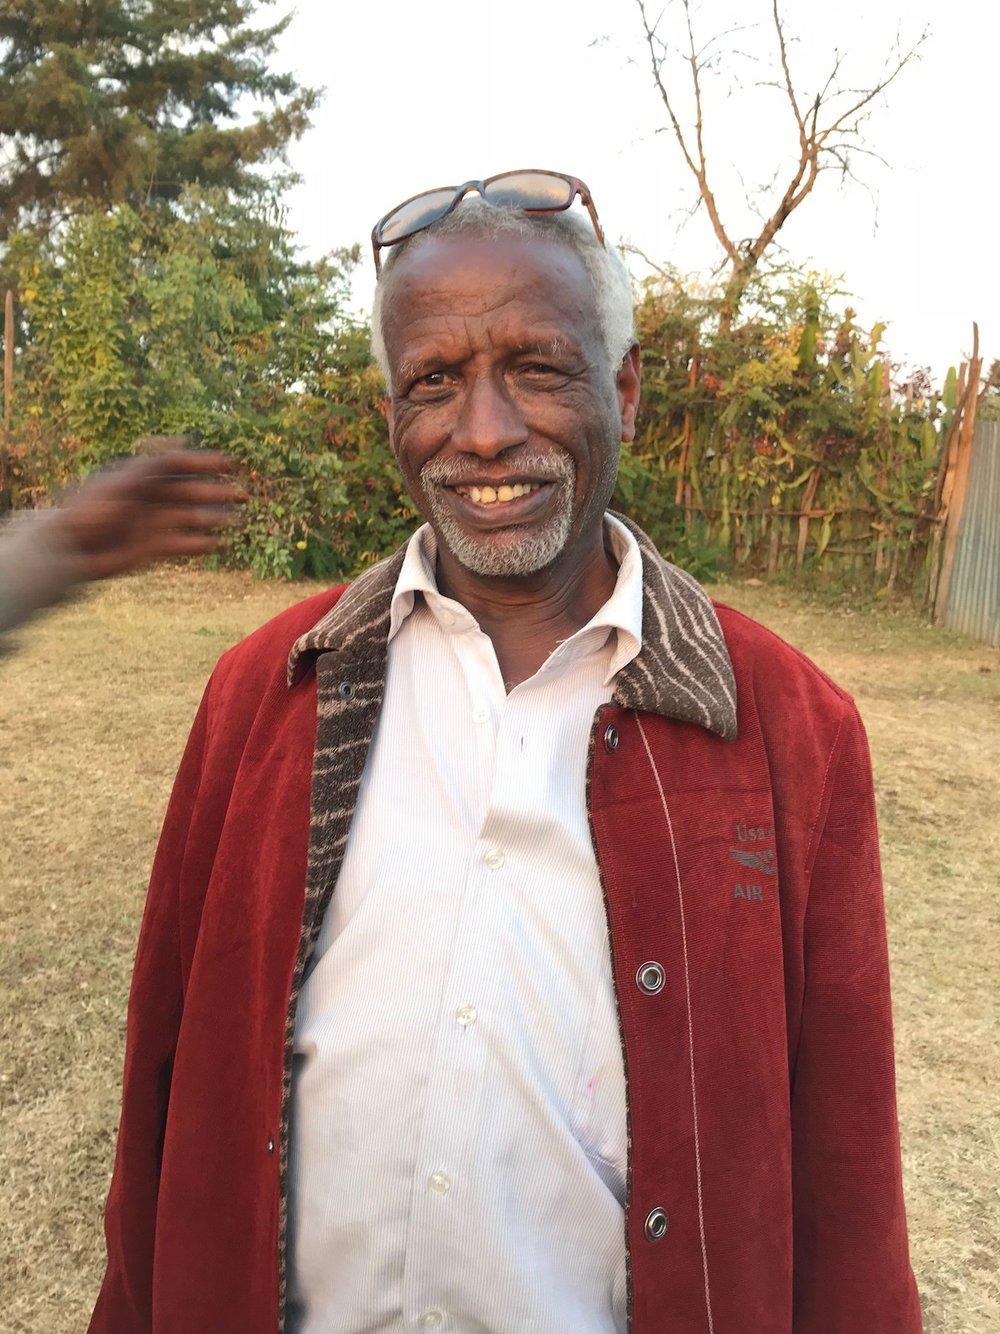 Tesfaye Girma - Manager of the Korate Washing Station, Sidam,Dilla Zone